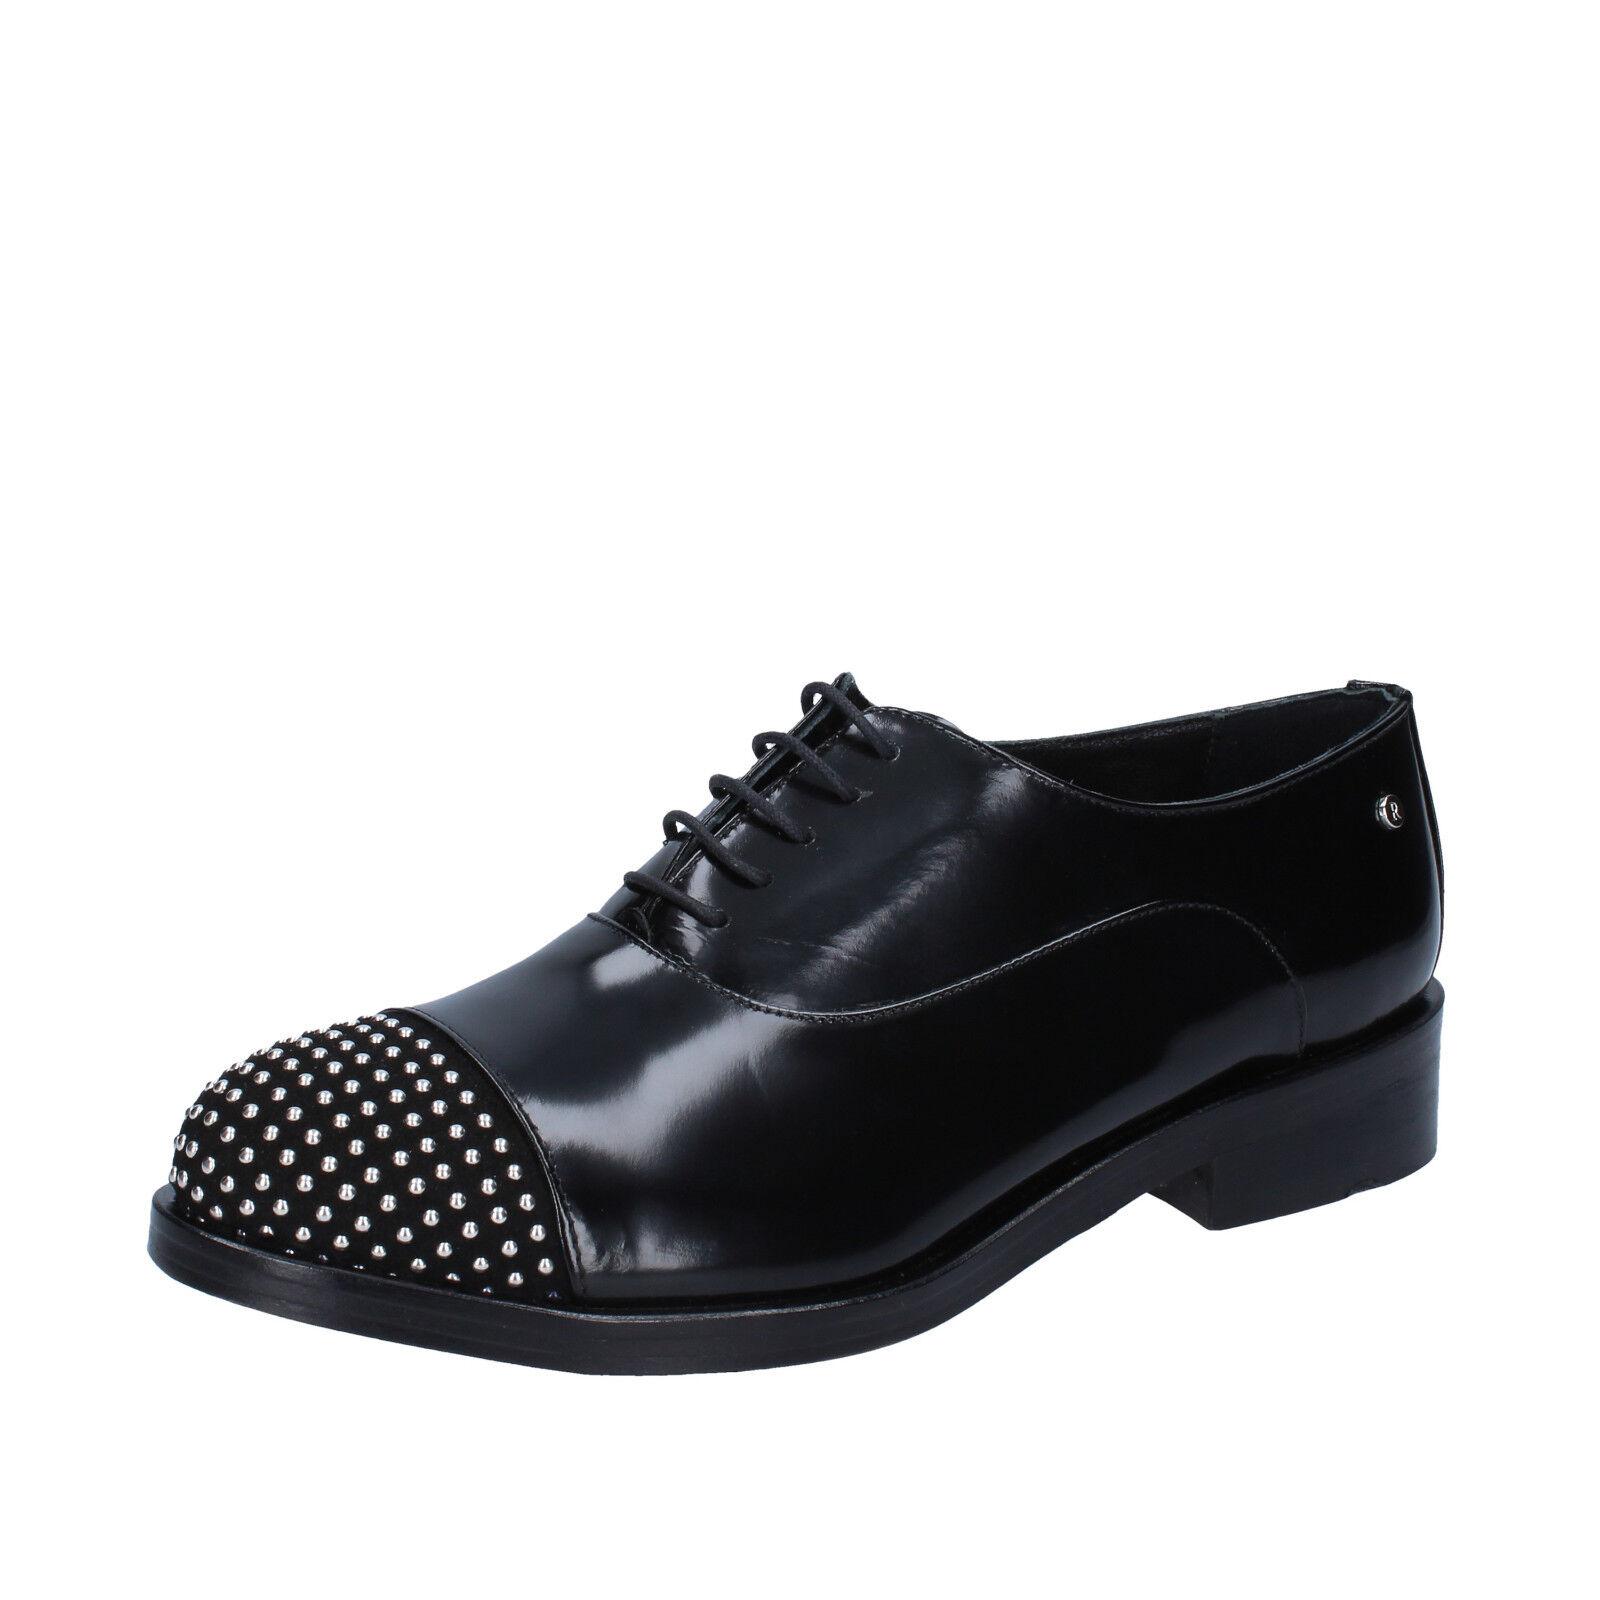 Scarpe donna REVE D'UN JOUR nero 38 EU classiche nero JOUR pelle lucida camoscio BZ462-D 900371